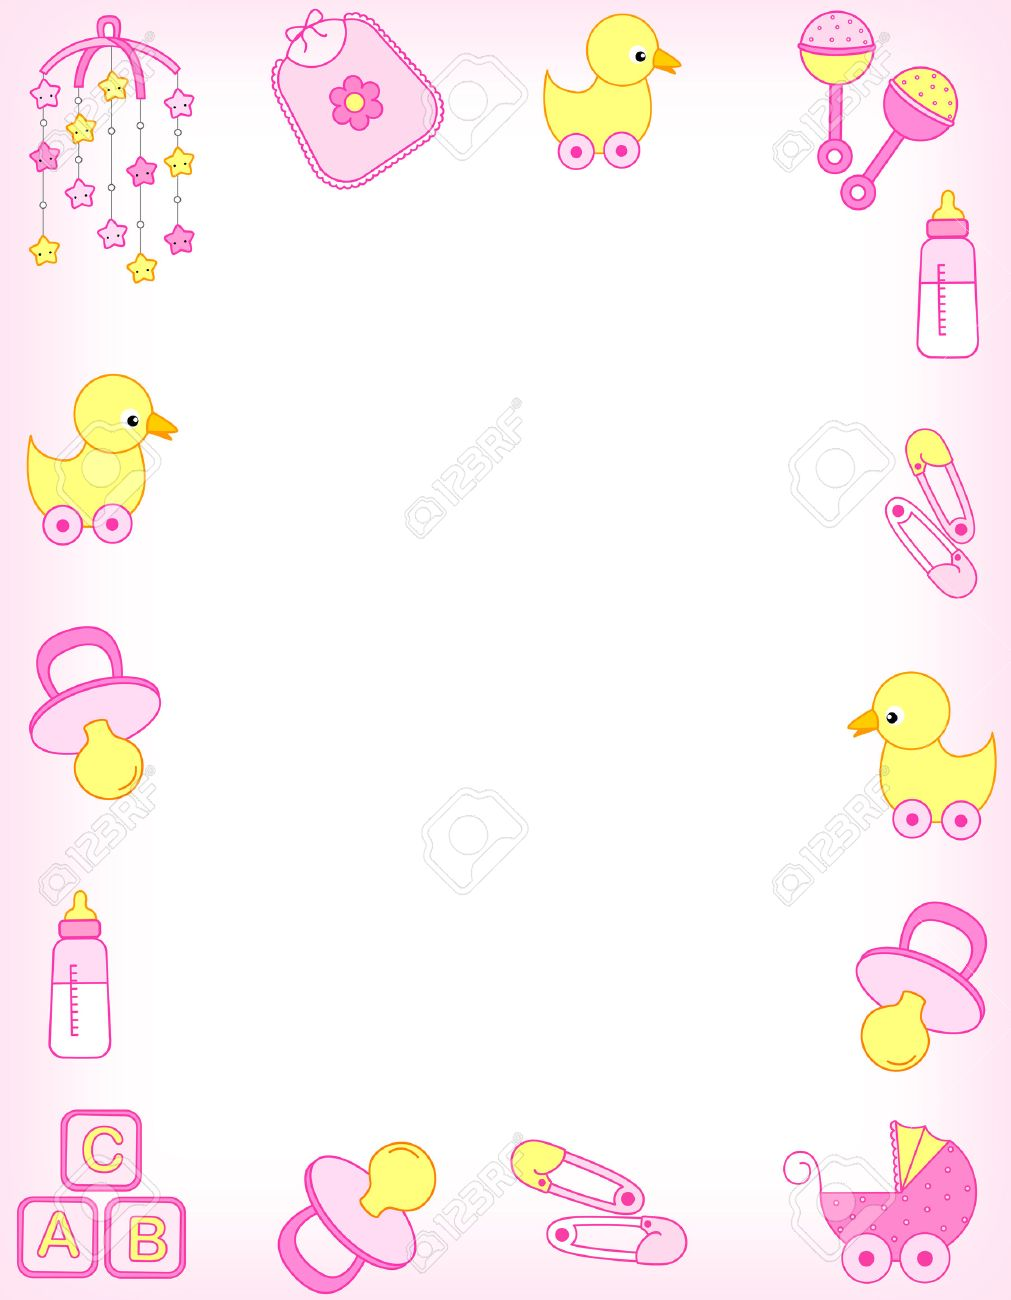 Pink Baby Shower Border : shower, border, Illustration, Shower, Invitation, Border, Frame.., Stock, Photo,, Picture, Royalty, Image., Image, 38747902.